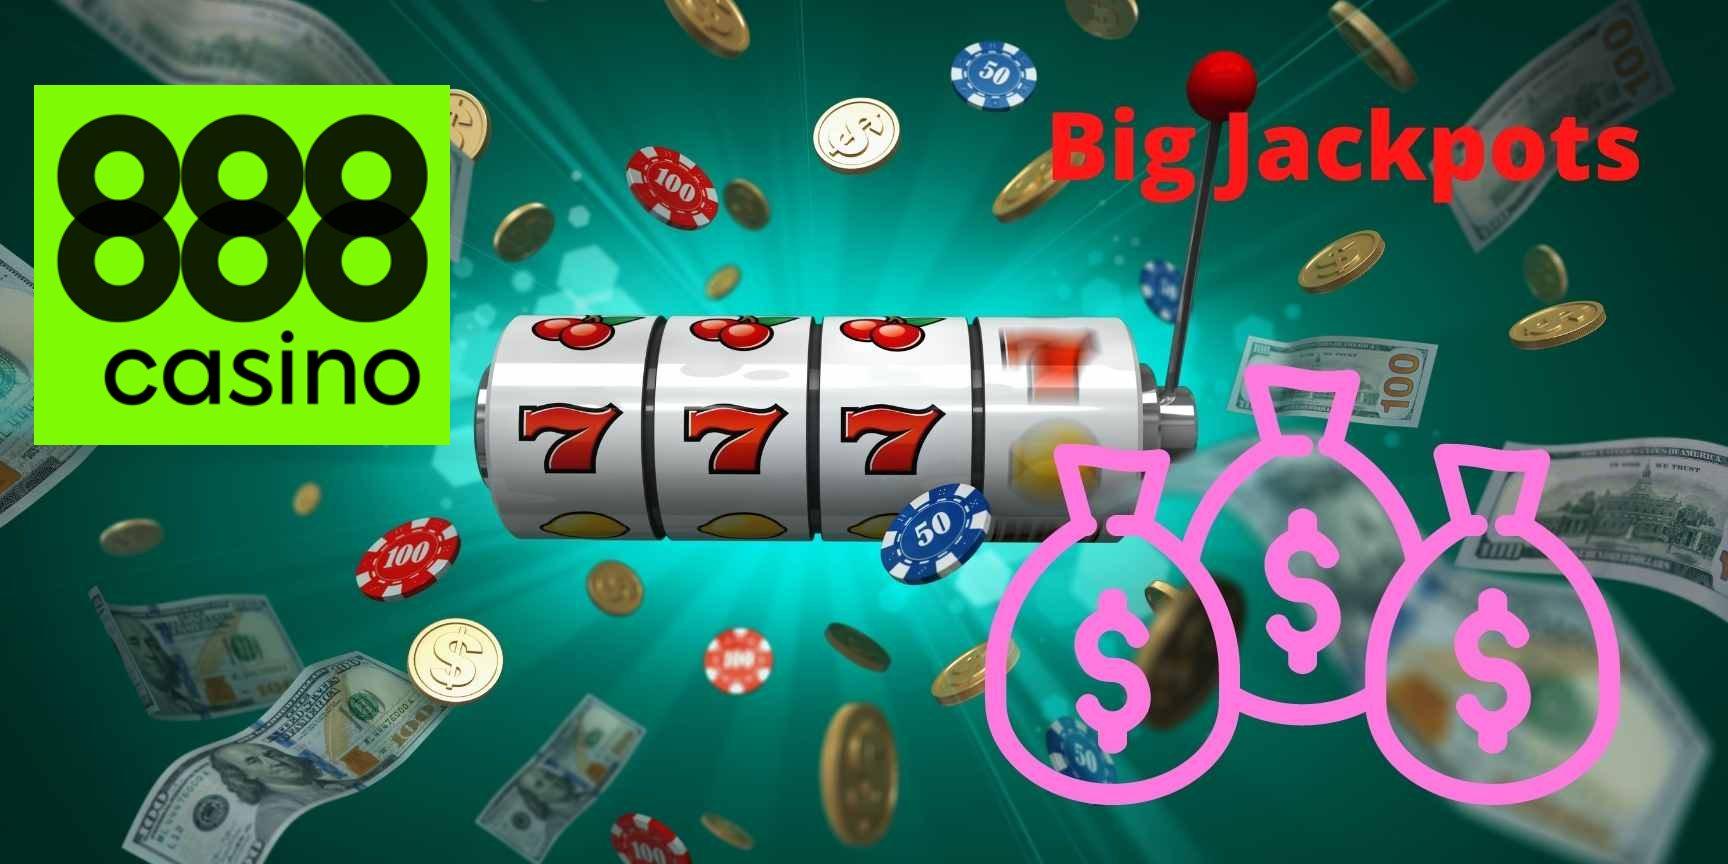 big jackpots